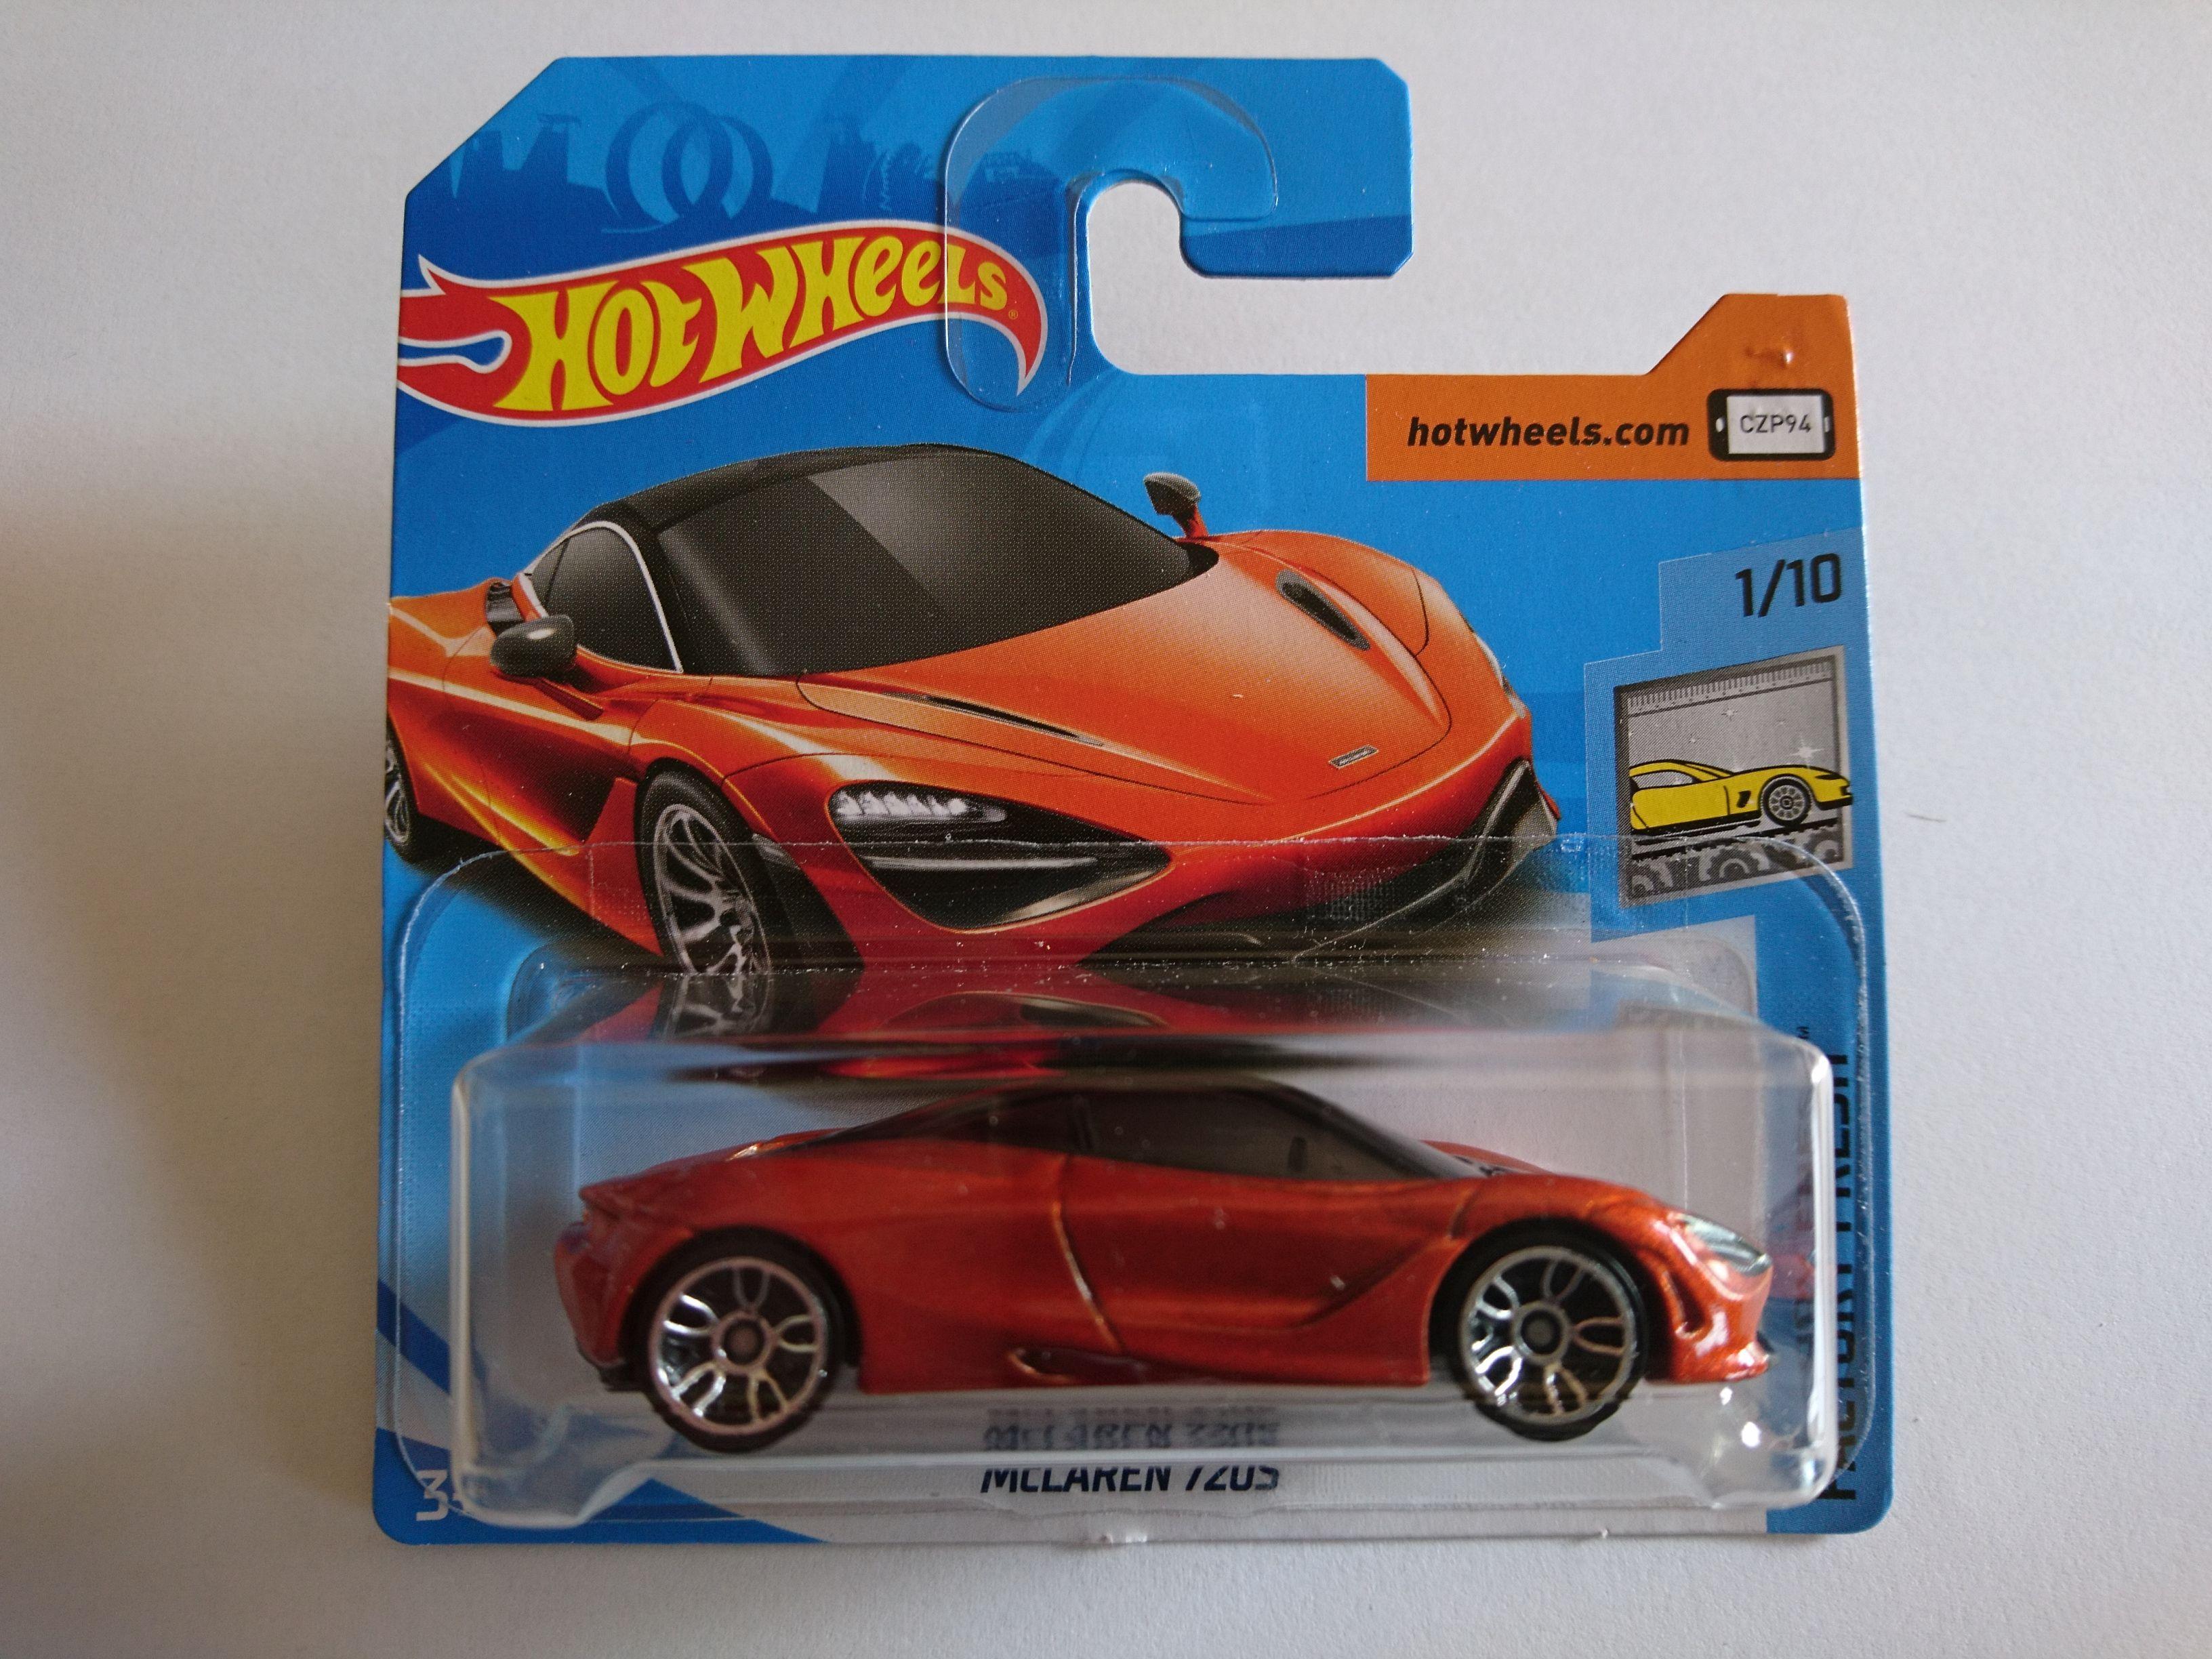 2018 Mclaren 720s Hot Wheels Collection 1 64 Hotwheels